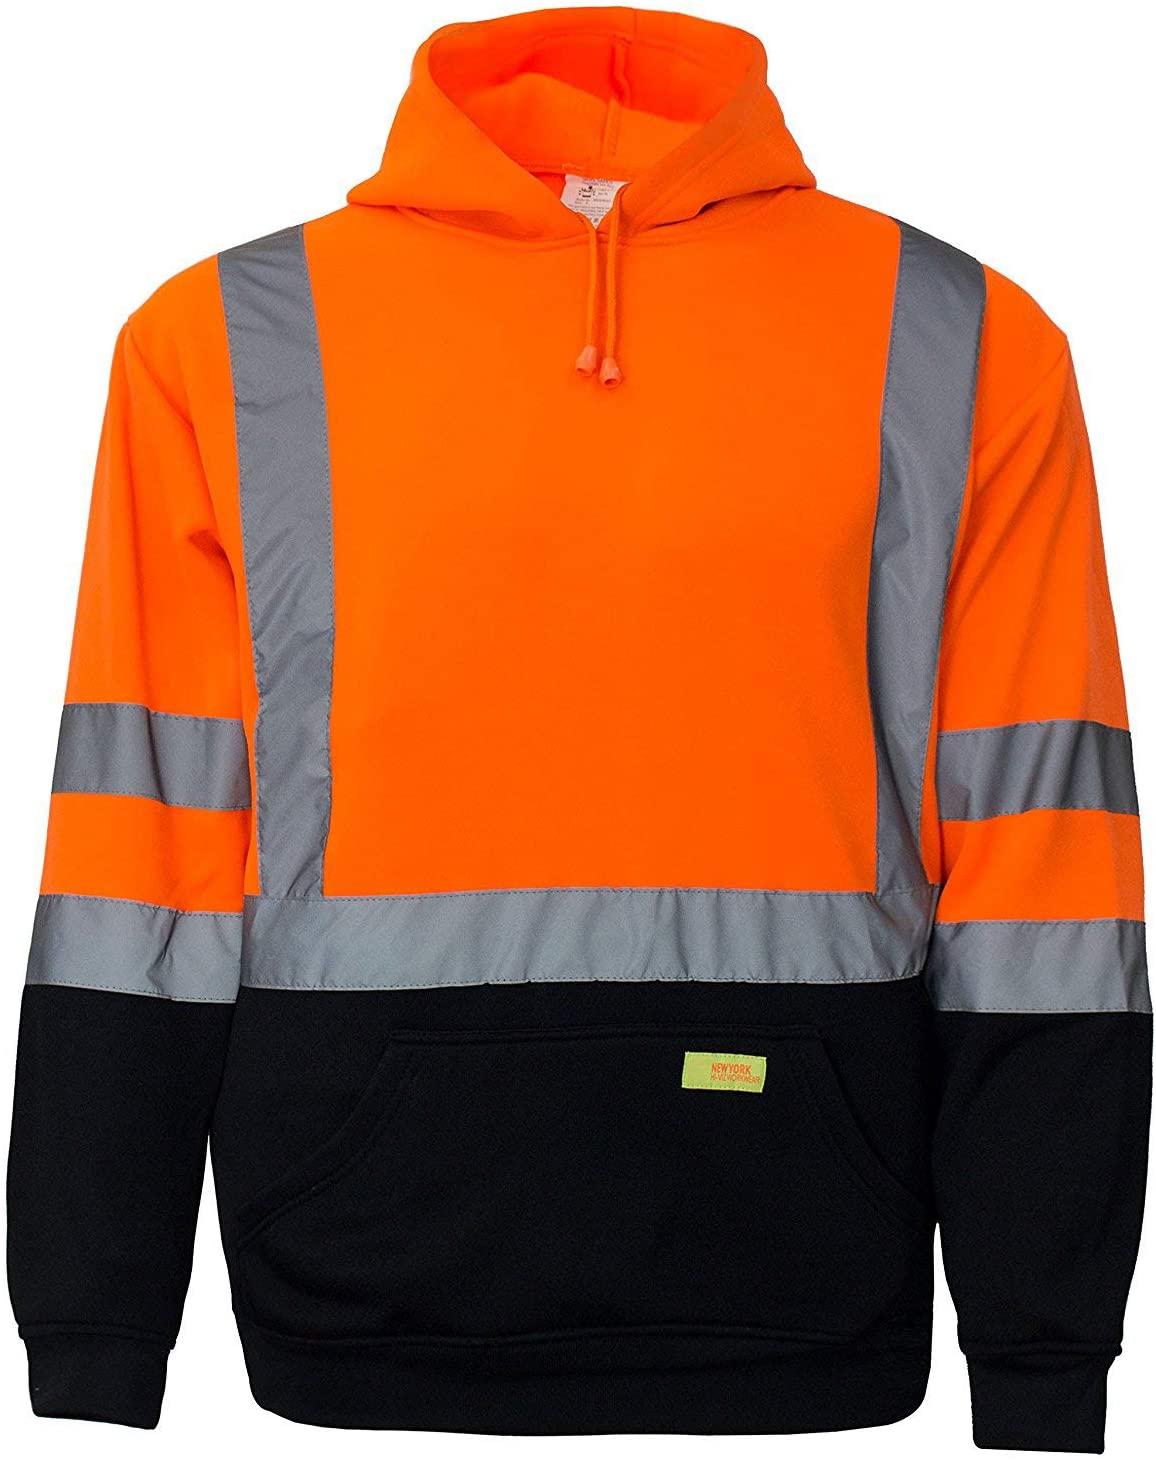 New York Hi-Viz Workwear H8311 Men's ANSI Class 3 High Visibility Class 3 Sweatshirt, Hooded Pullover, Knit Lining, Black Bottom (Orange, 4-XL)